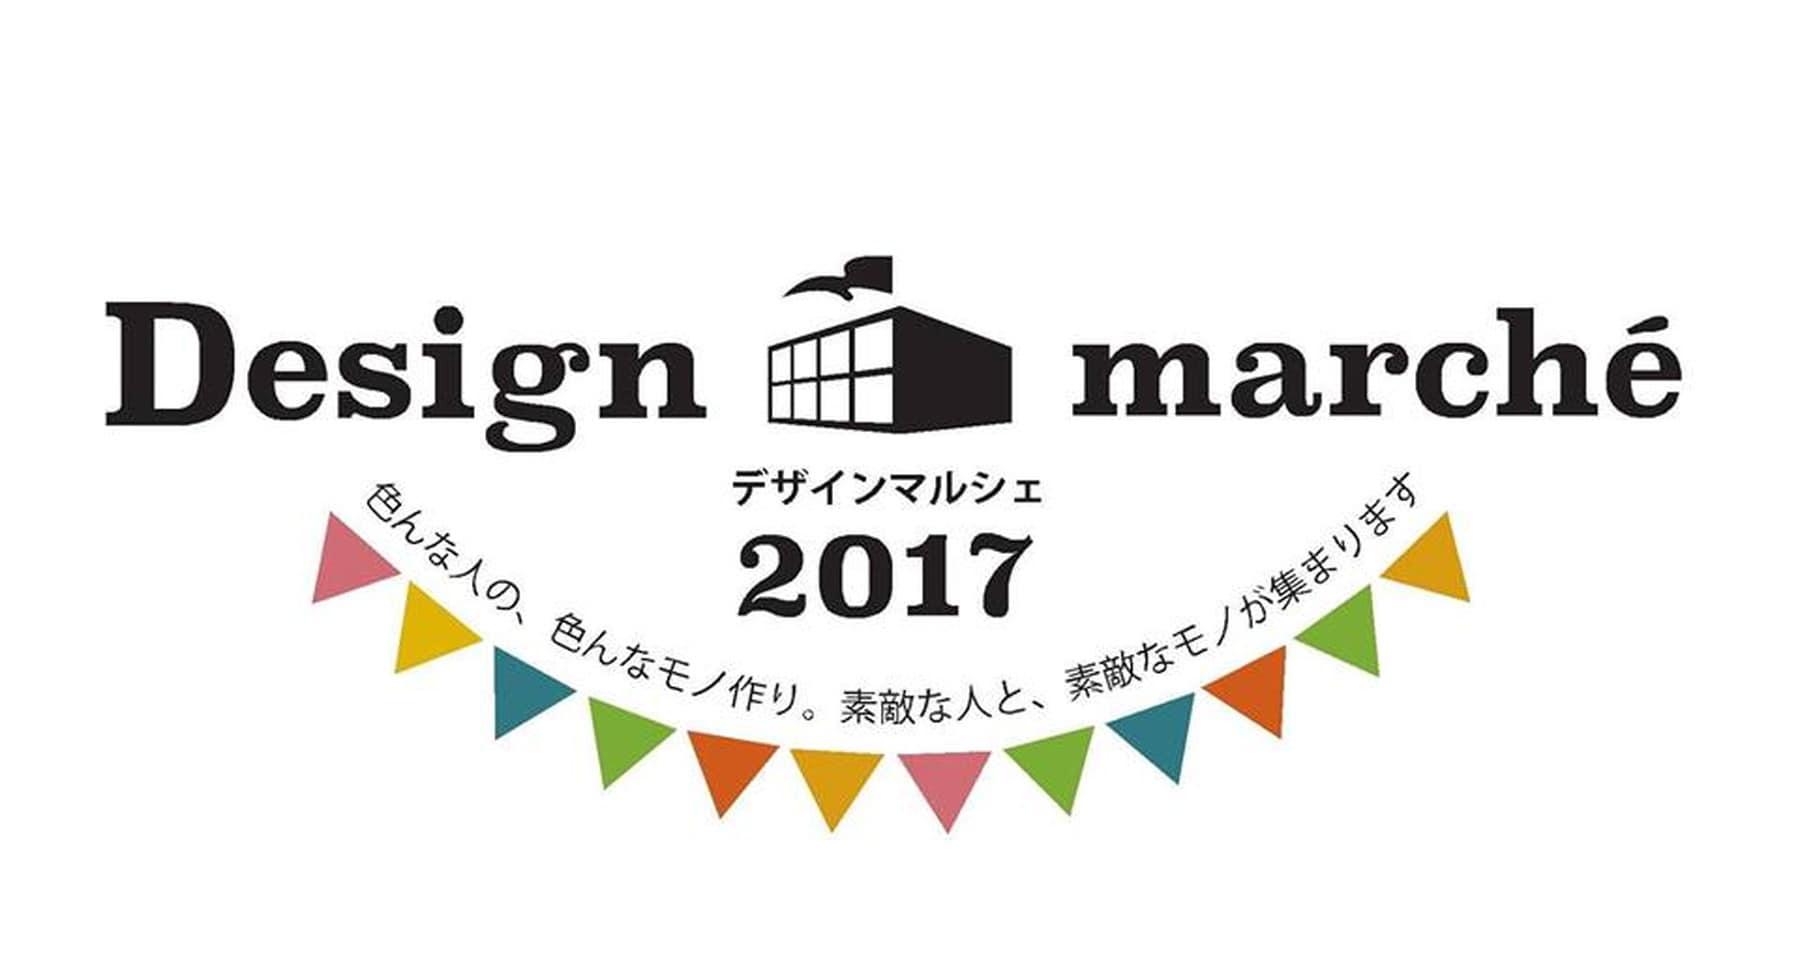 「Design marche 2017」開催のお知らせ/KOKOROISHIソファ